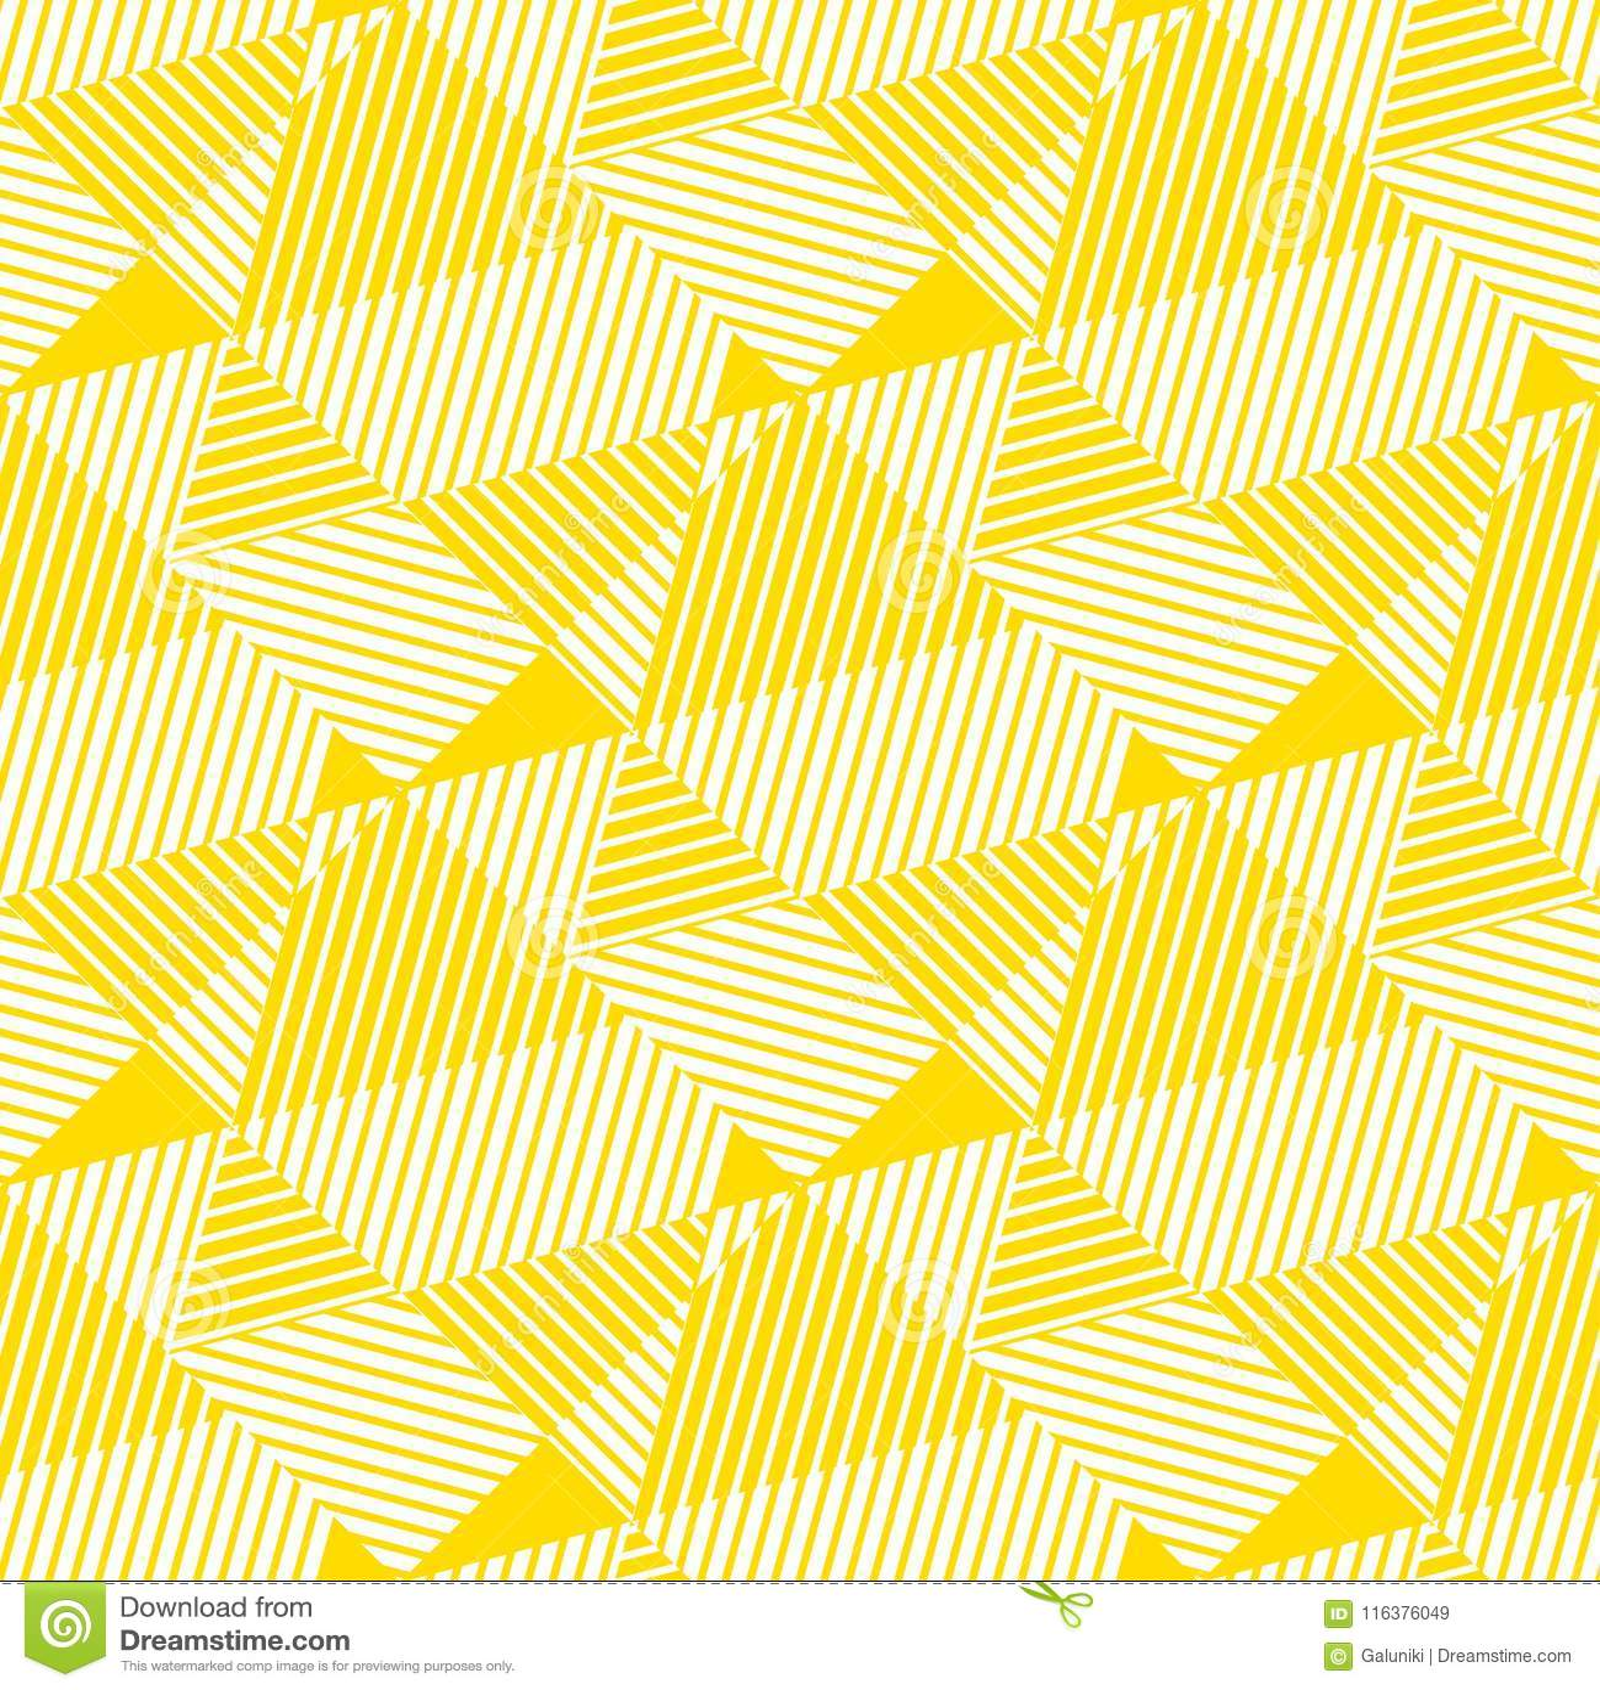 Pale Yellow Geometric Seamless Pattern. Stock Vector ...